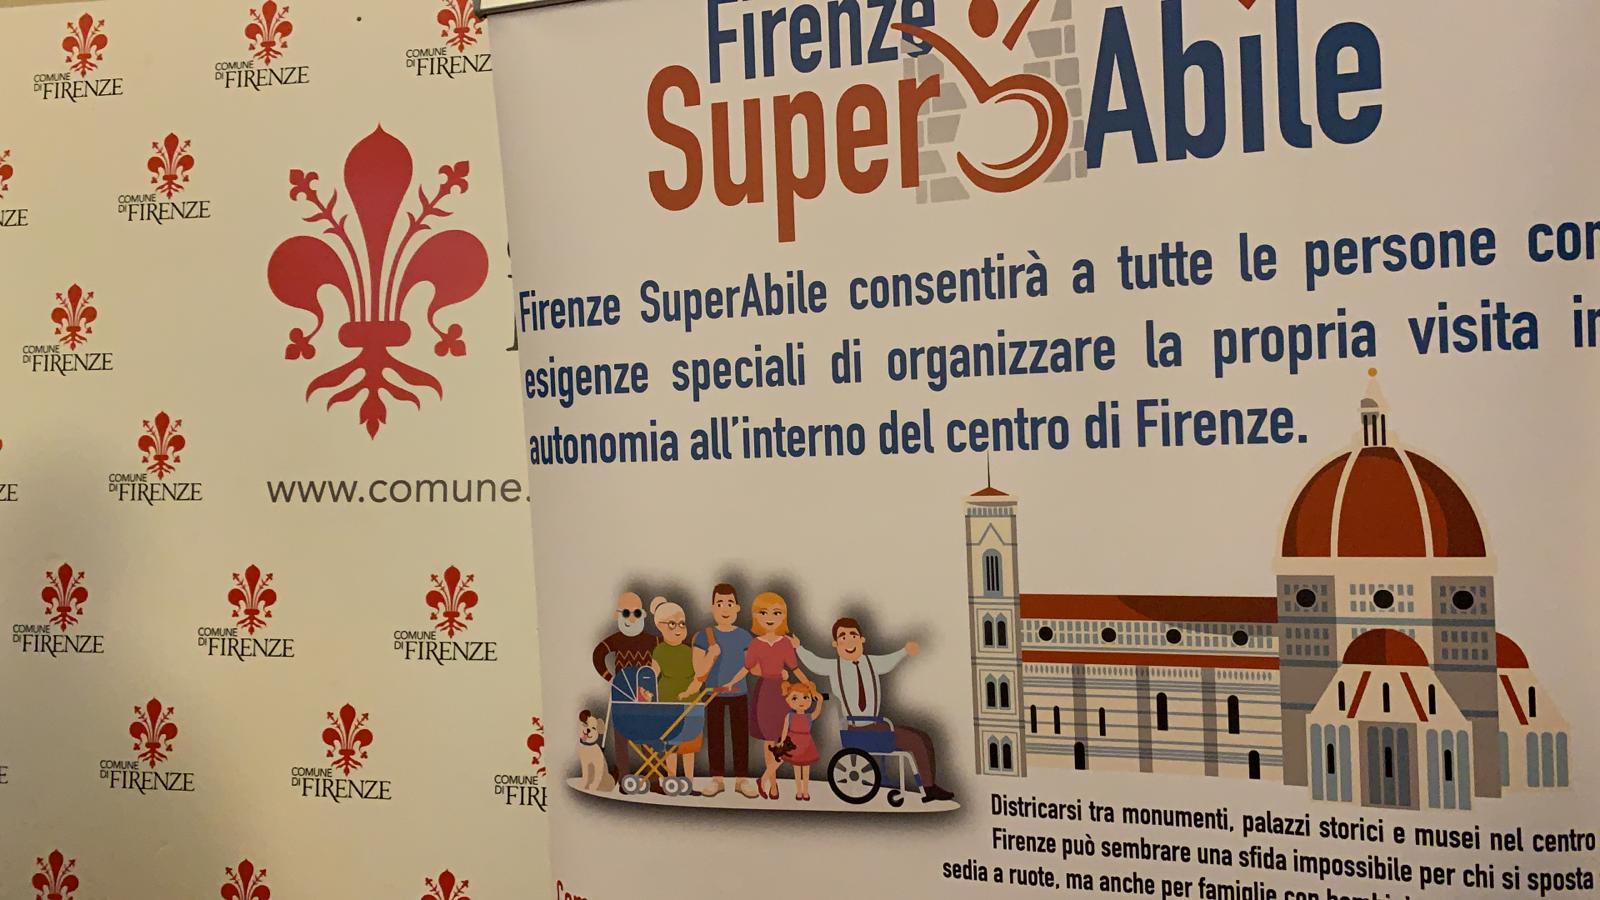 Firenze Superabile